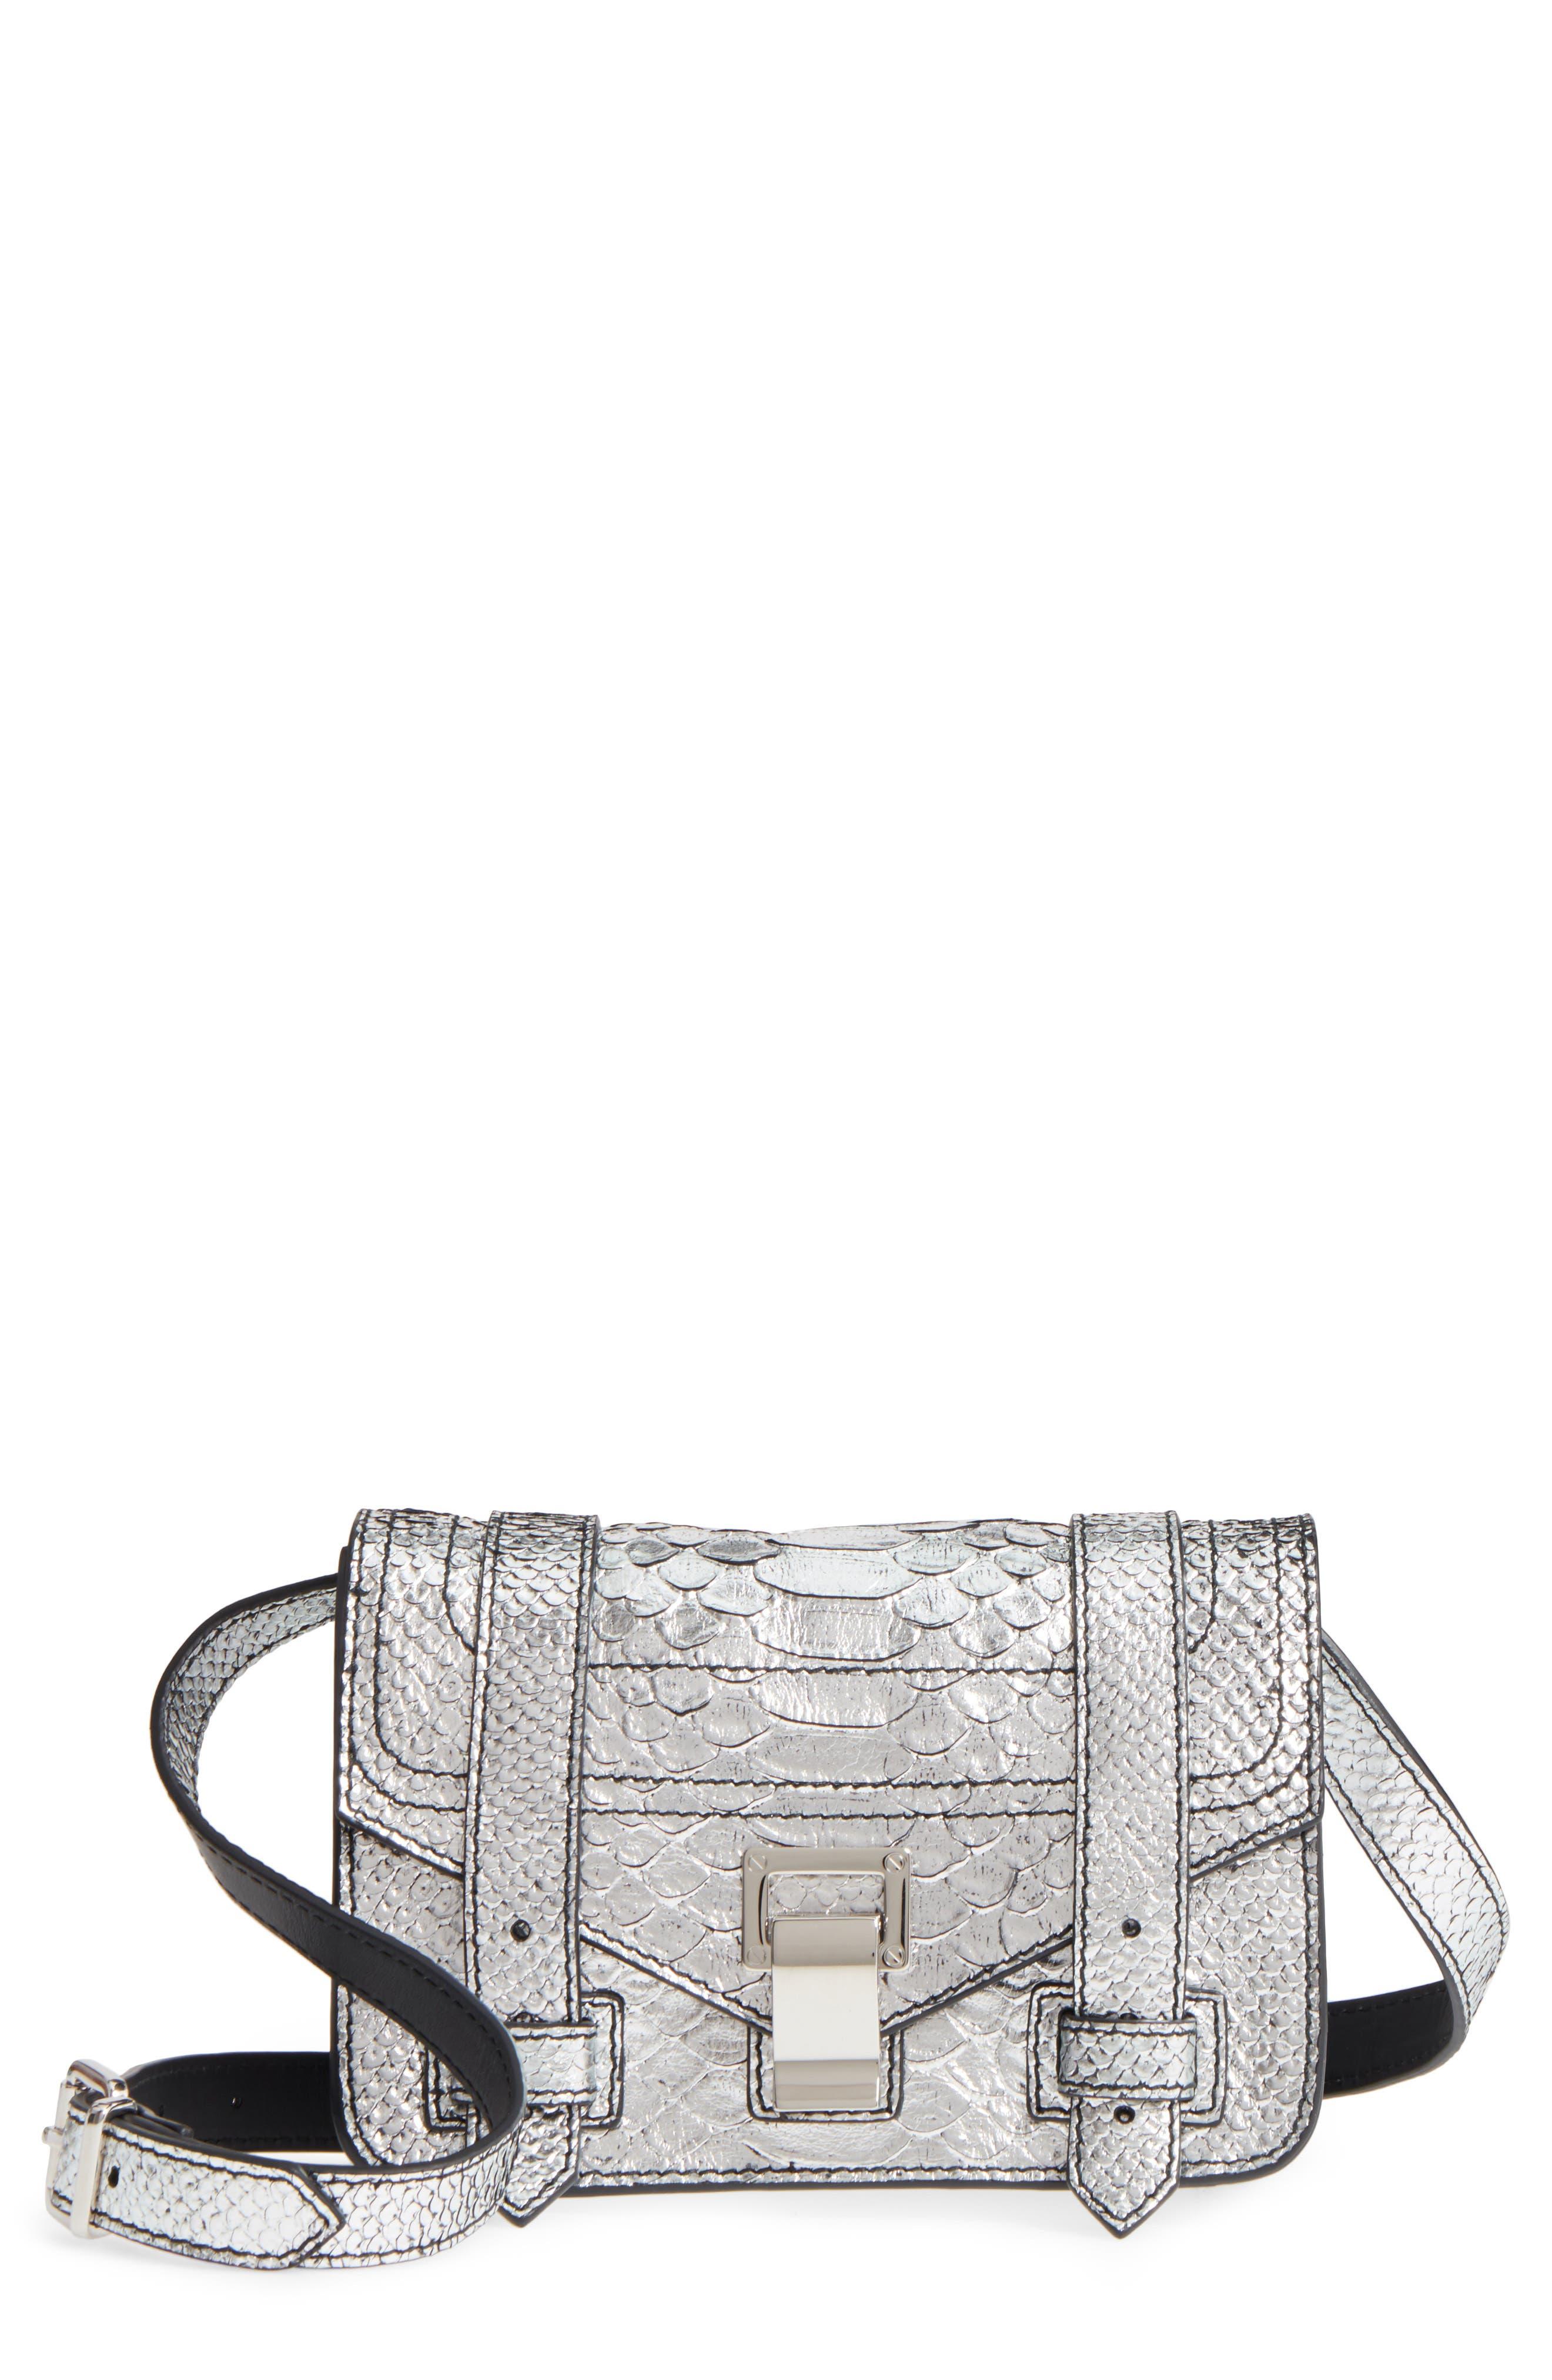 Proenza Schouler Mini PS1 Snakeskin Embossed Metallic Leather Crossbody Bag